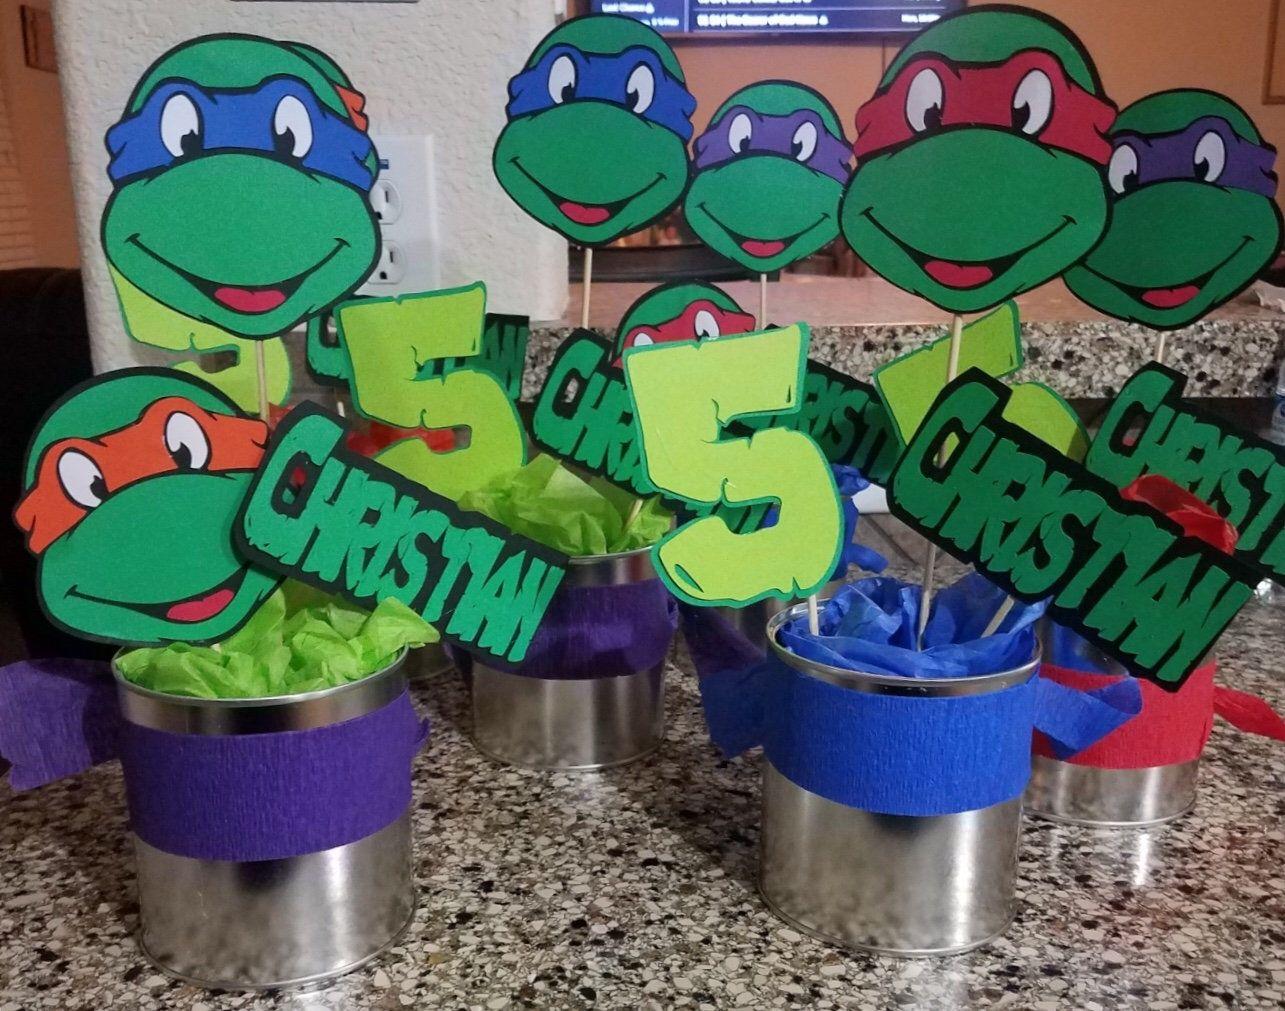 Tmnt Party 12 Piece Set Tmnt Centerpiece Teenage Mutant Ninja Etsy Mutant Ninja Turtles Party Ninja Turtles Birthday Party Teenage Mutant Ninja Turtles Party